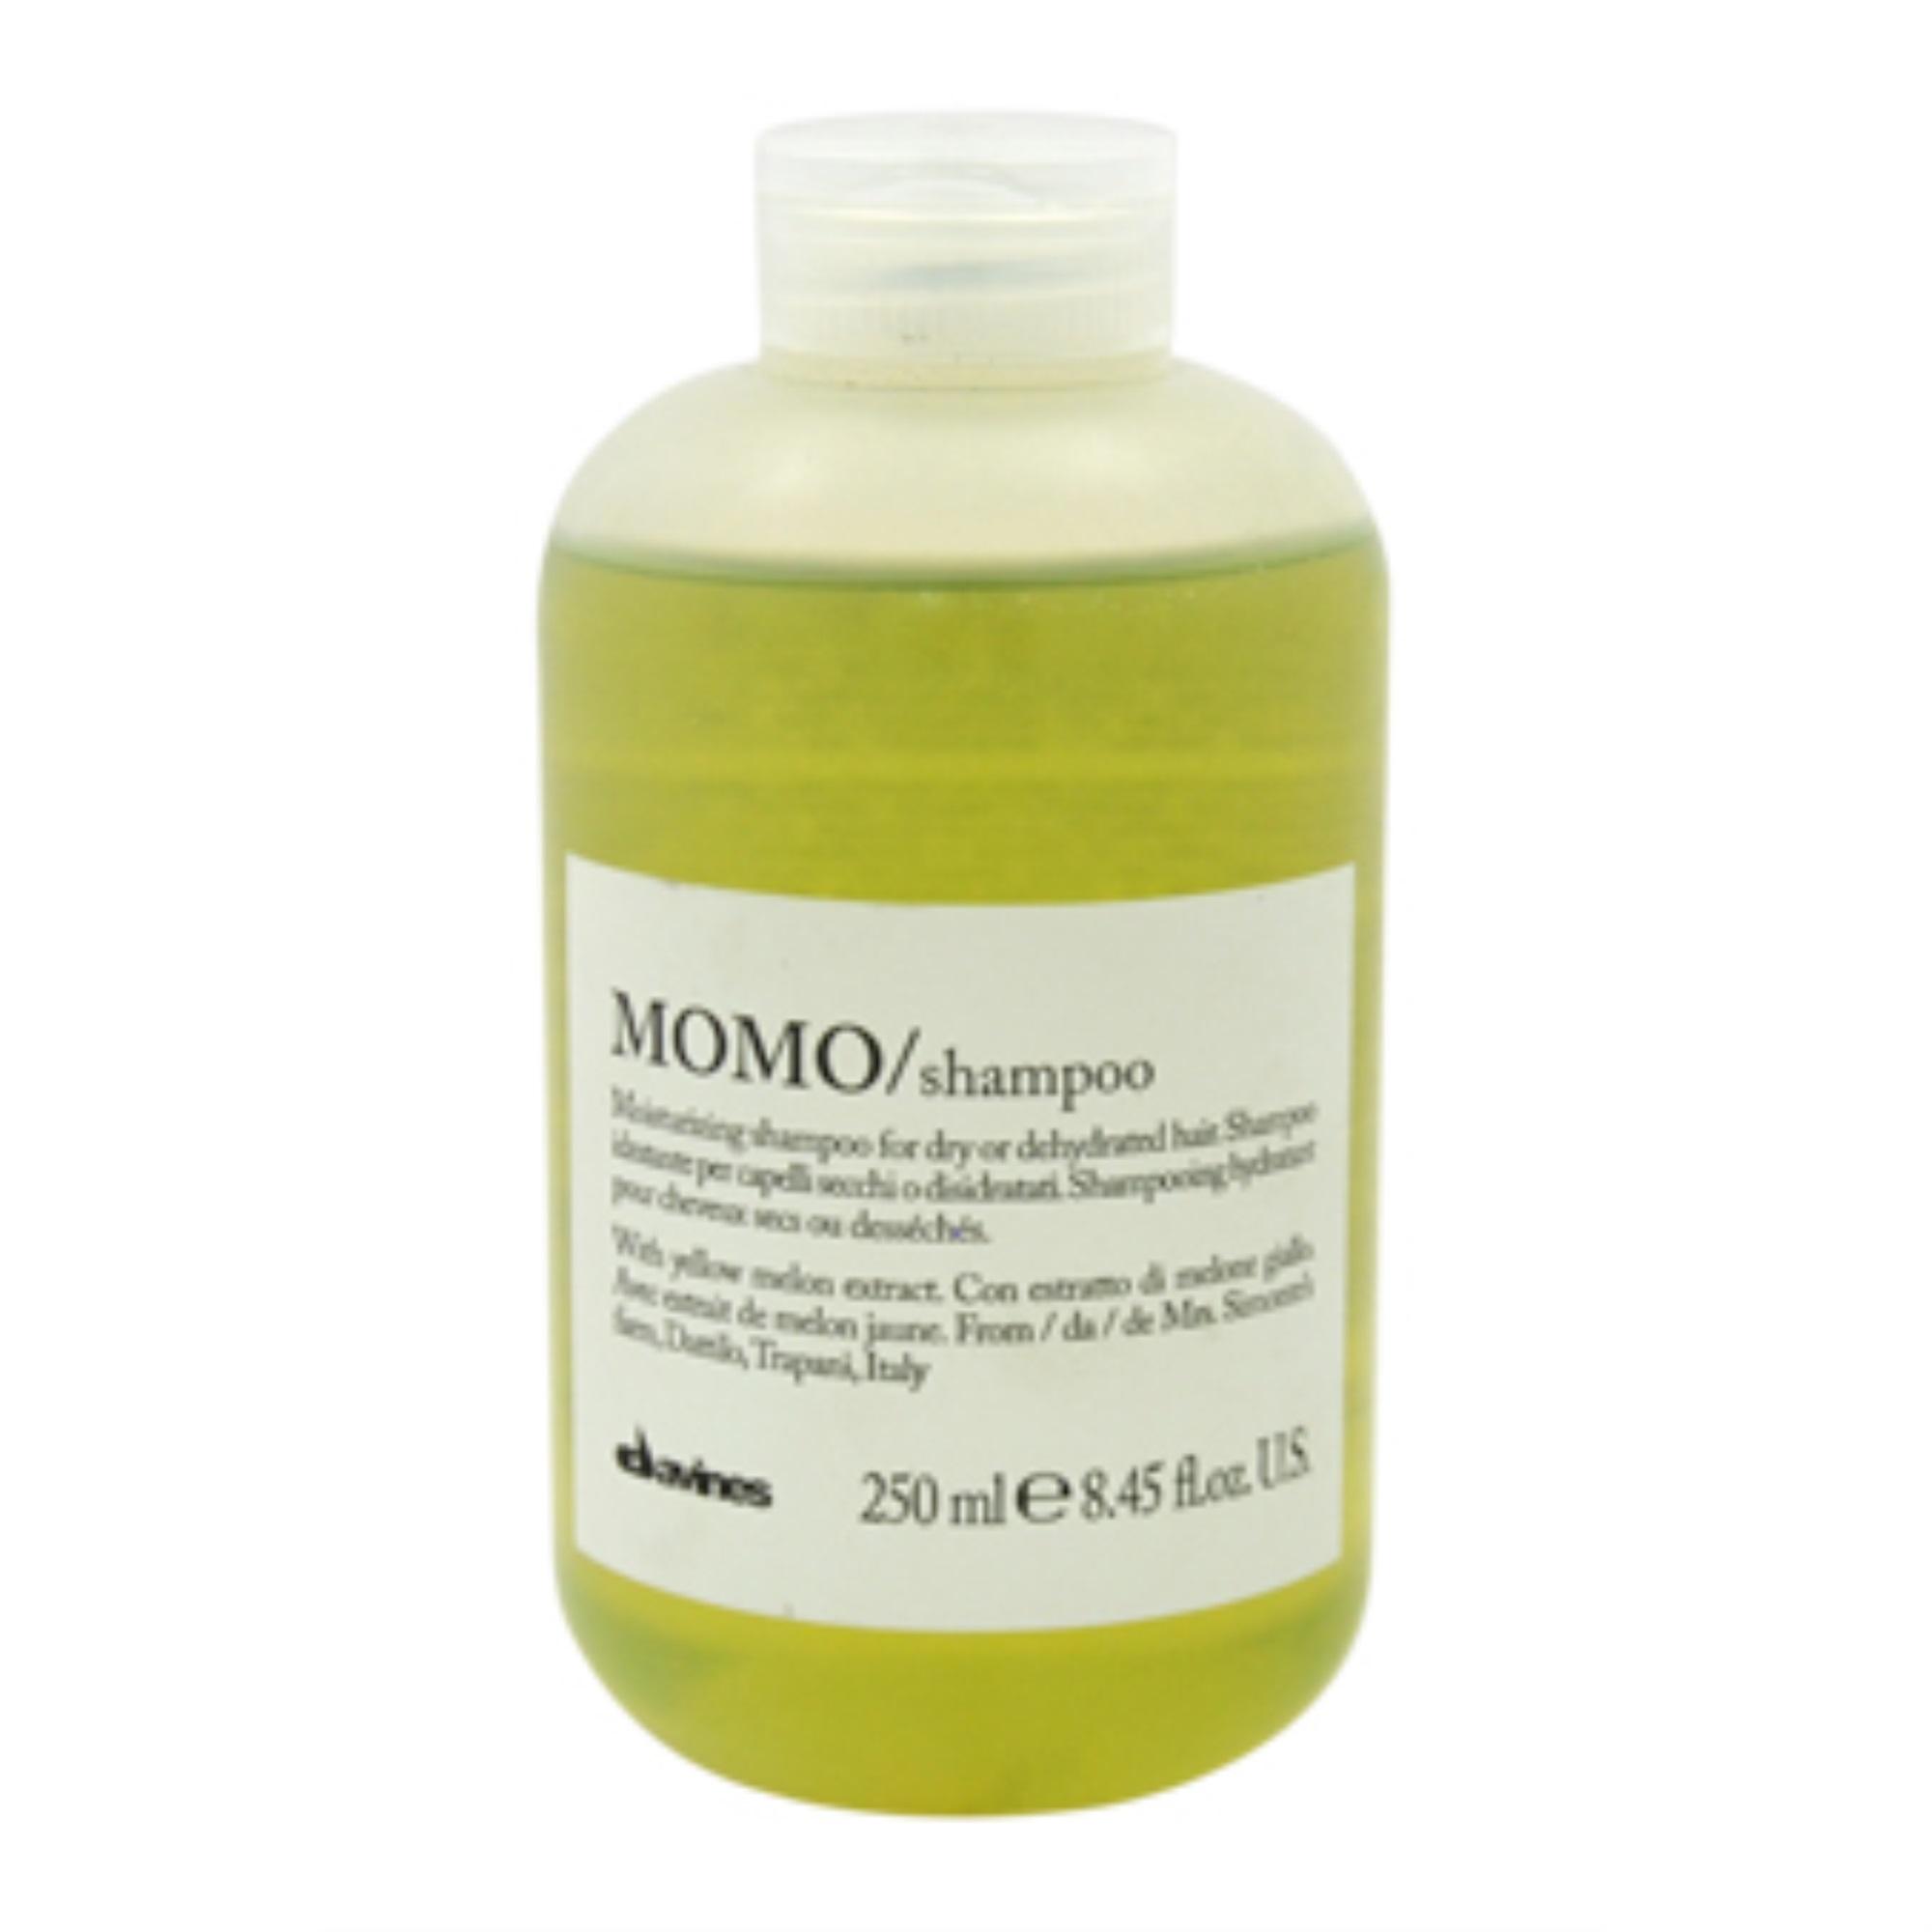 Momo Moisturizing Shampoo for Dry & Dehydrated Hair by Davines for Unisex - 8.45 oz Shampoo   Walmart Canada